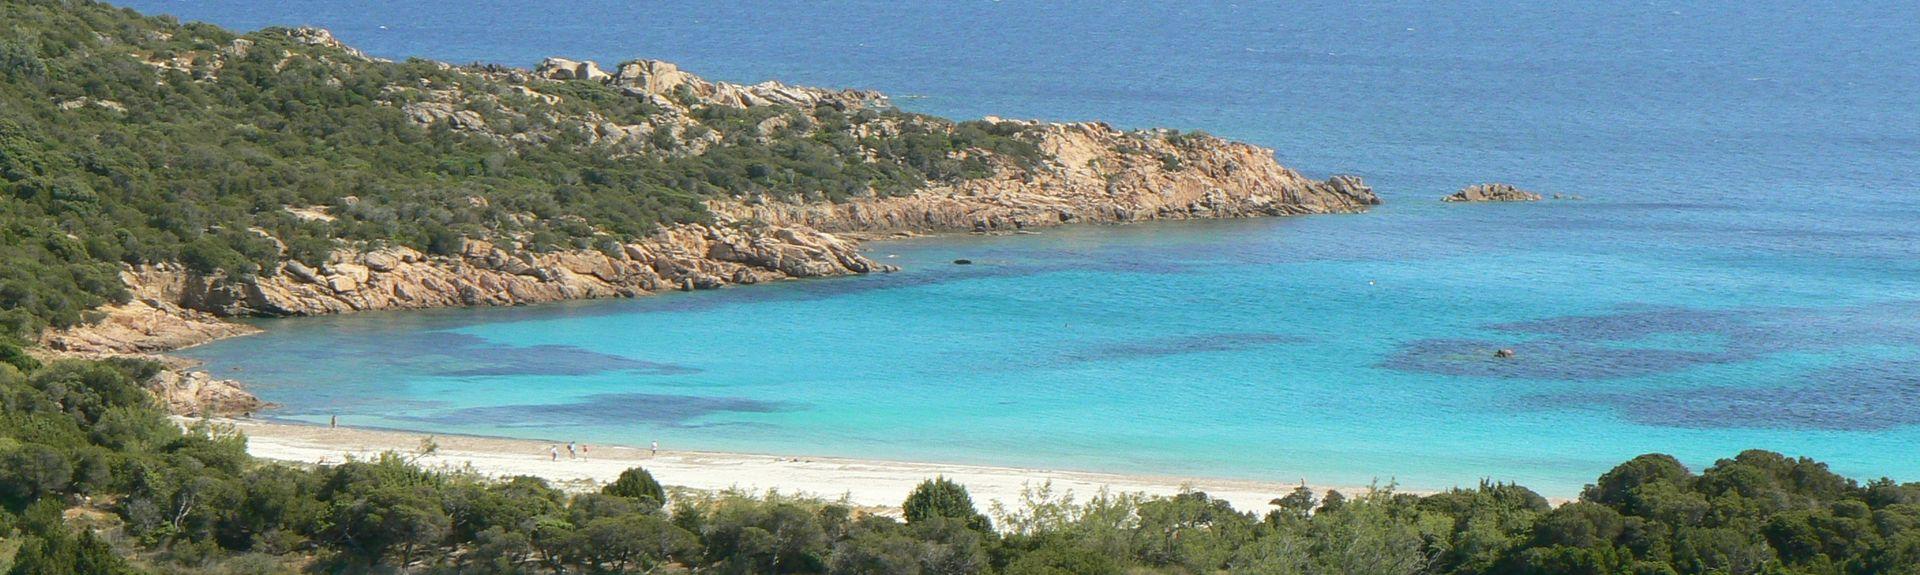 Belvedere-Campomoro, Korsika, Ranska